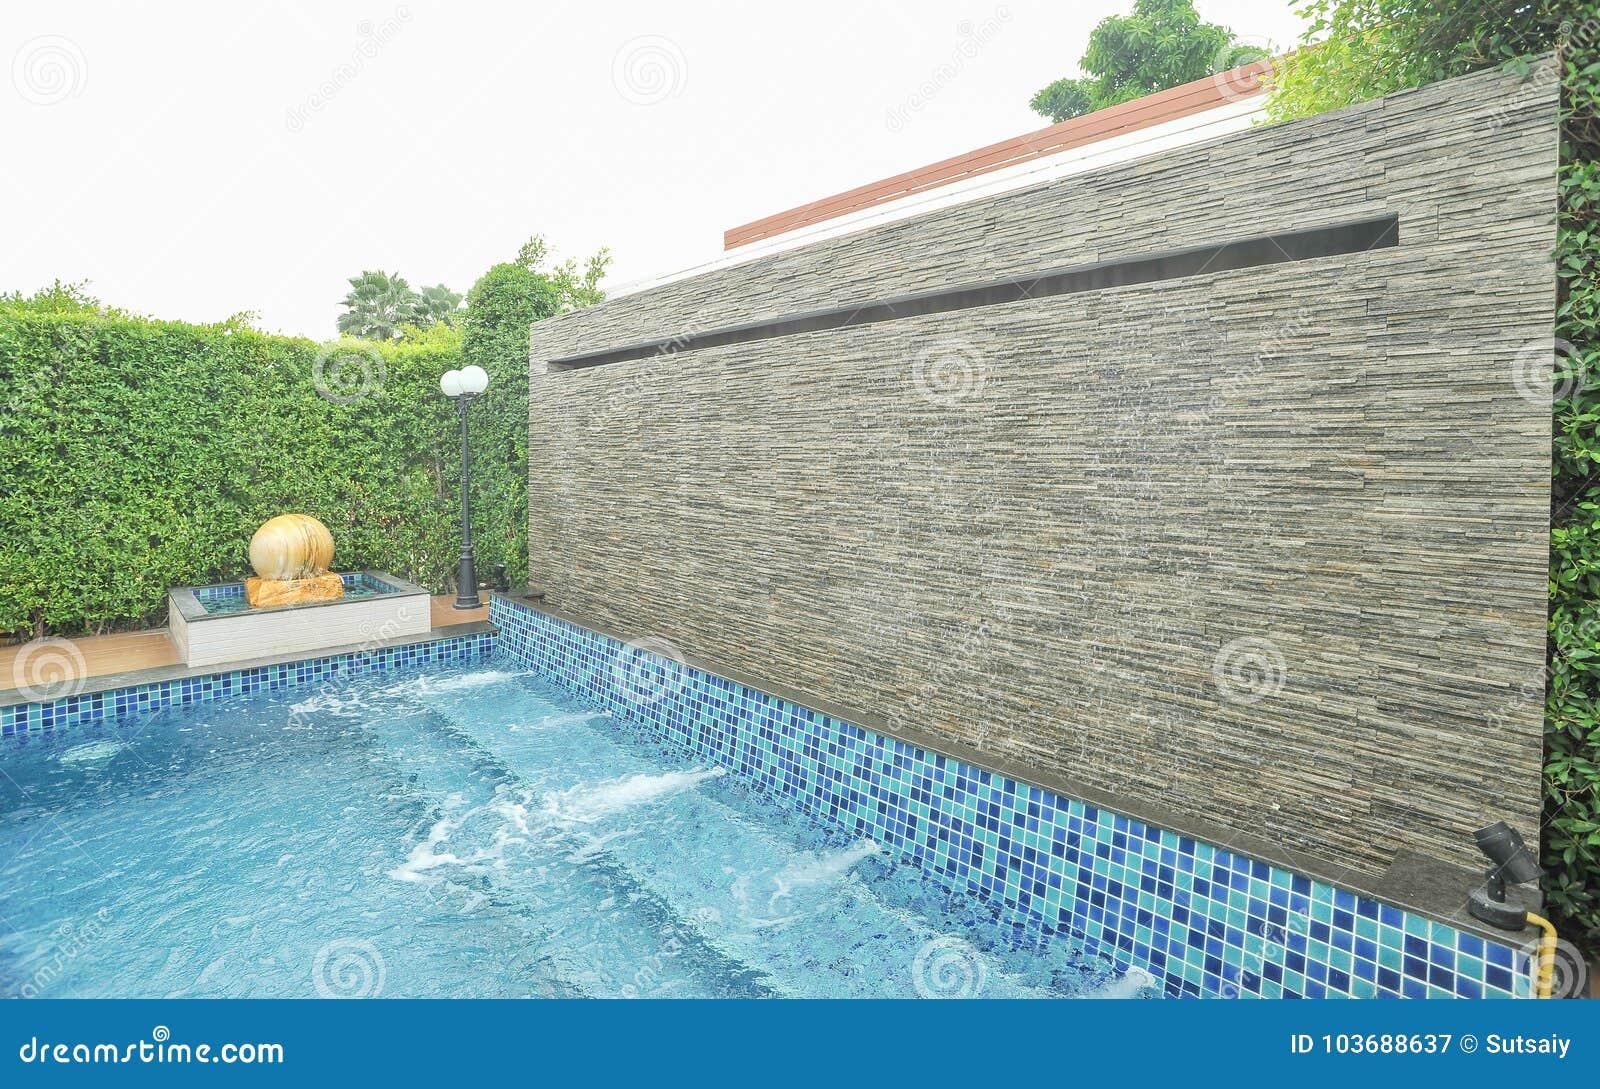 Waterfall Fountain In Swimming Pool Stock Image - Image of ...